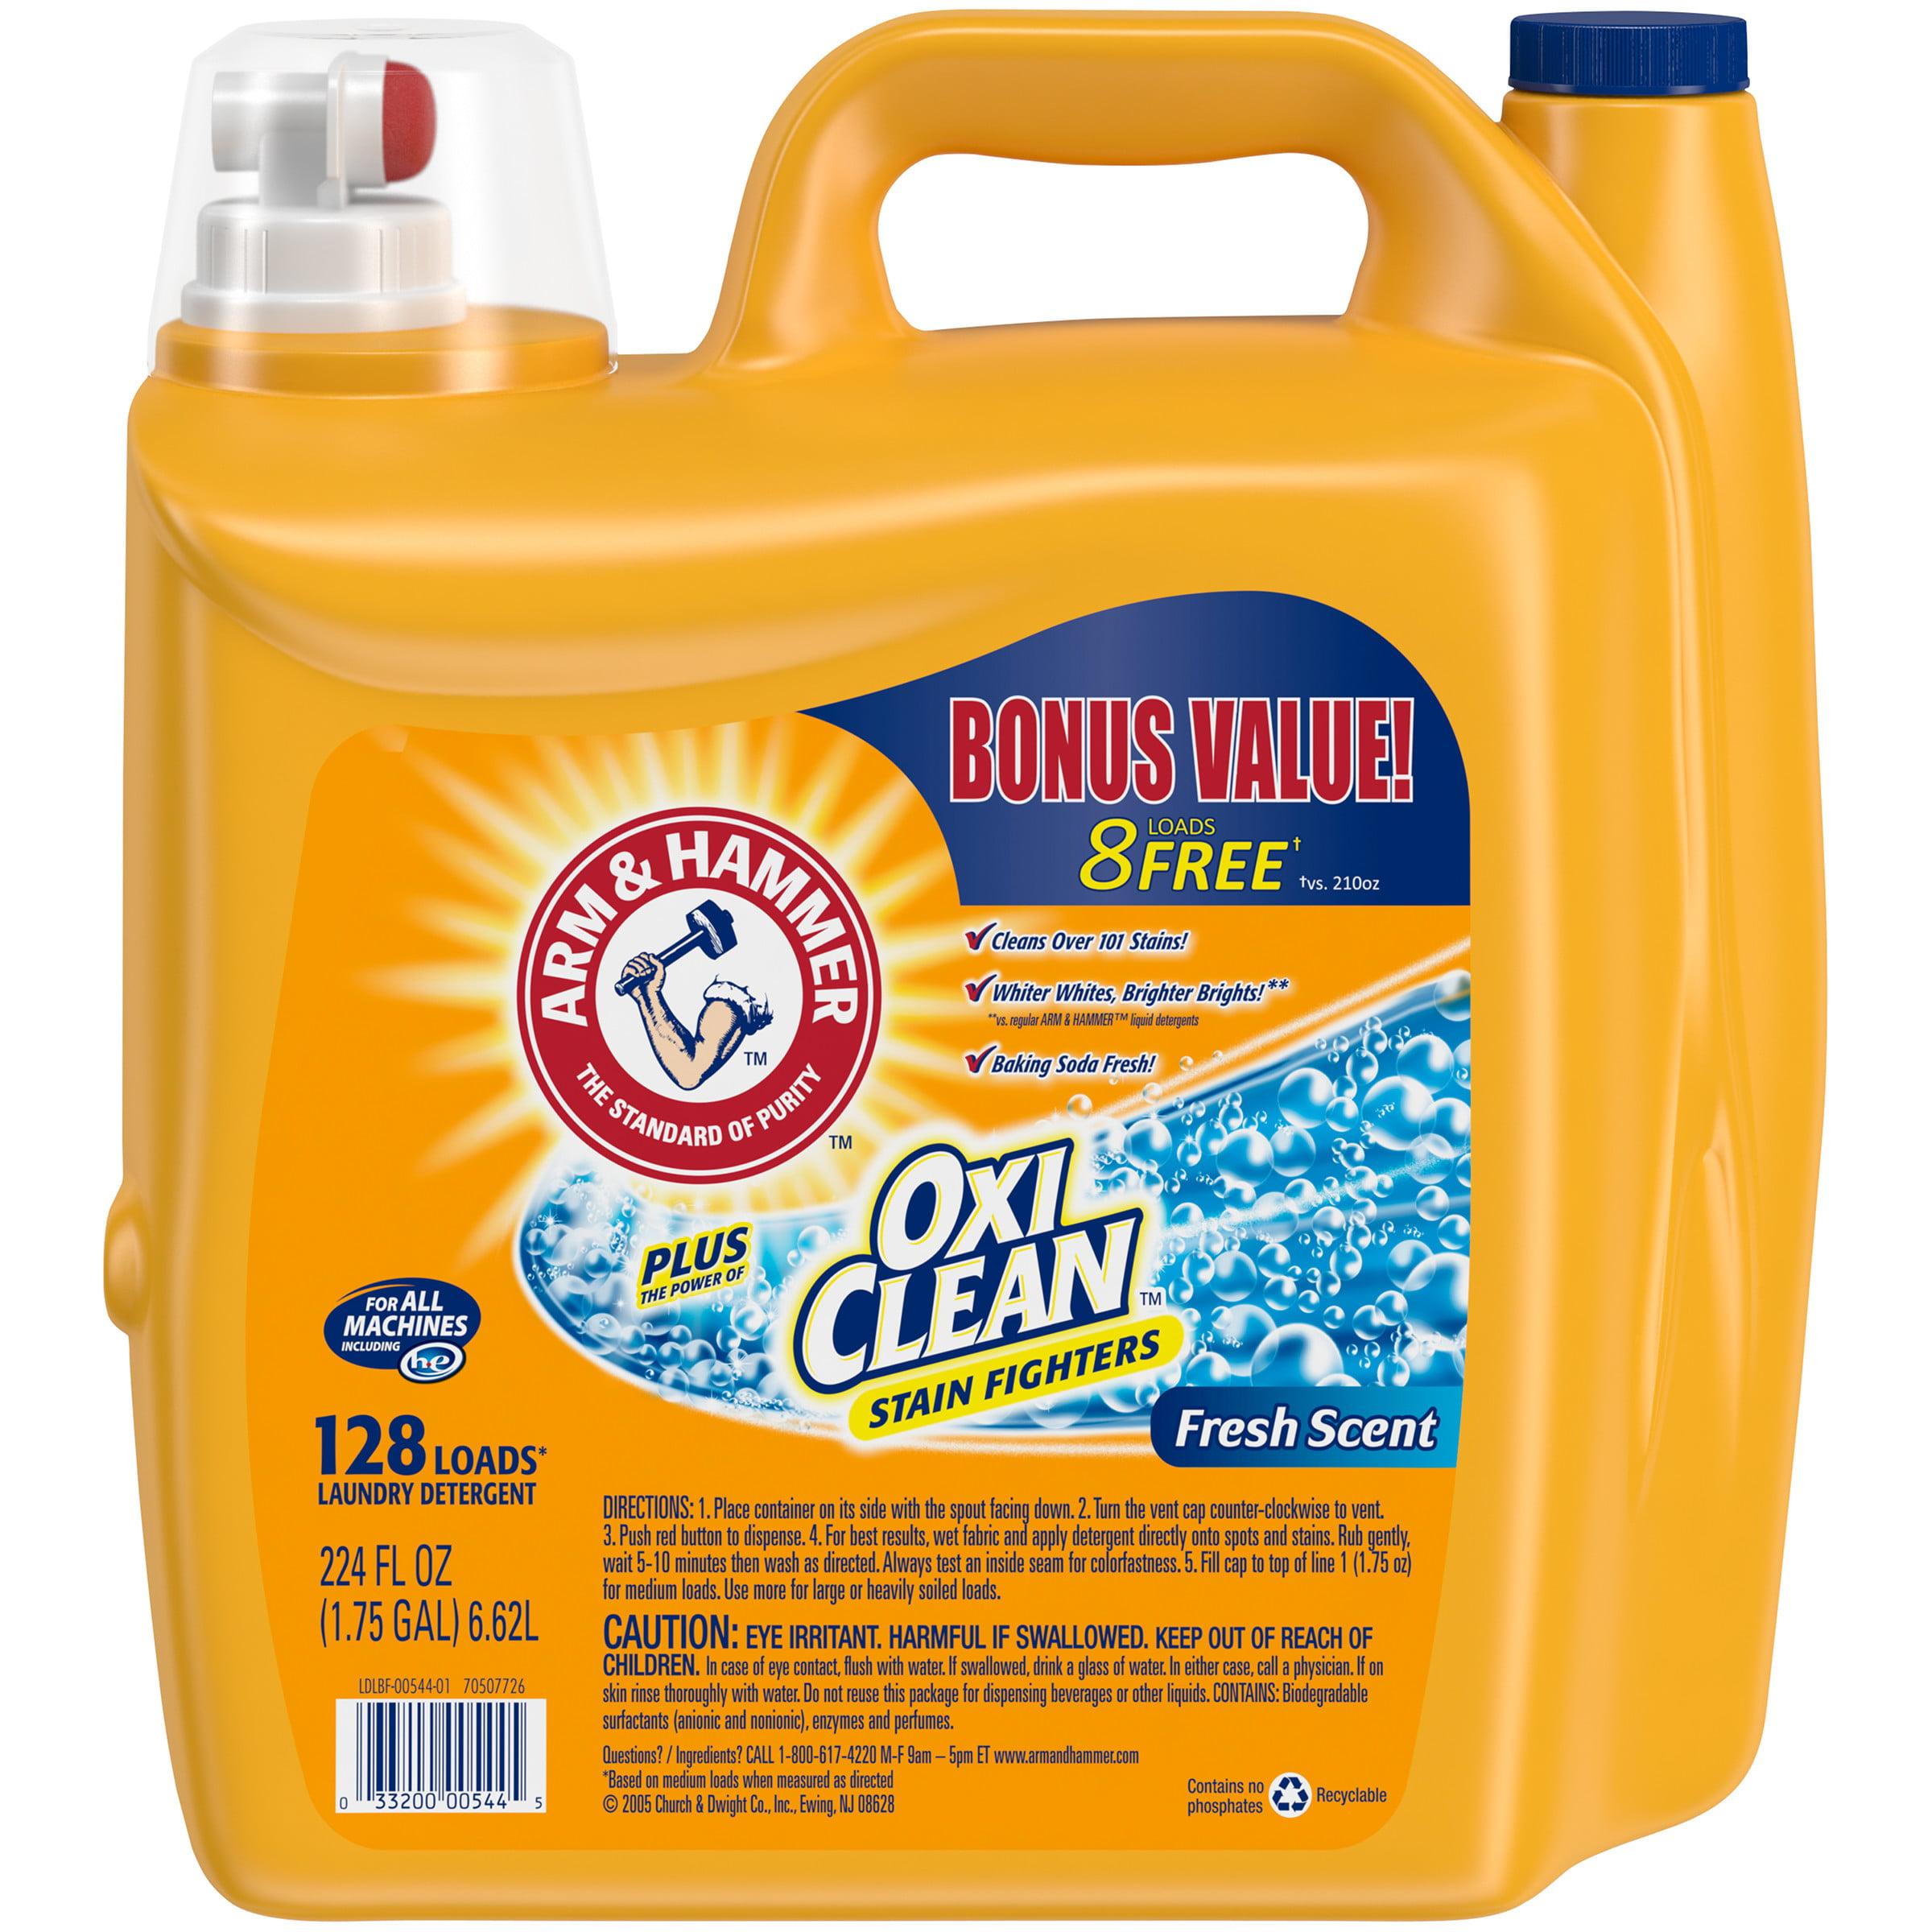 Arm & Hammer Plus OxiClean Fresh Scent Liquid Laundry Detergent, 224 fl oz